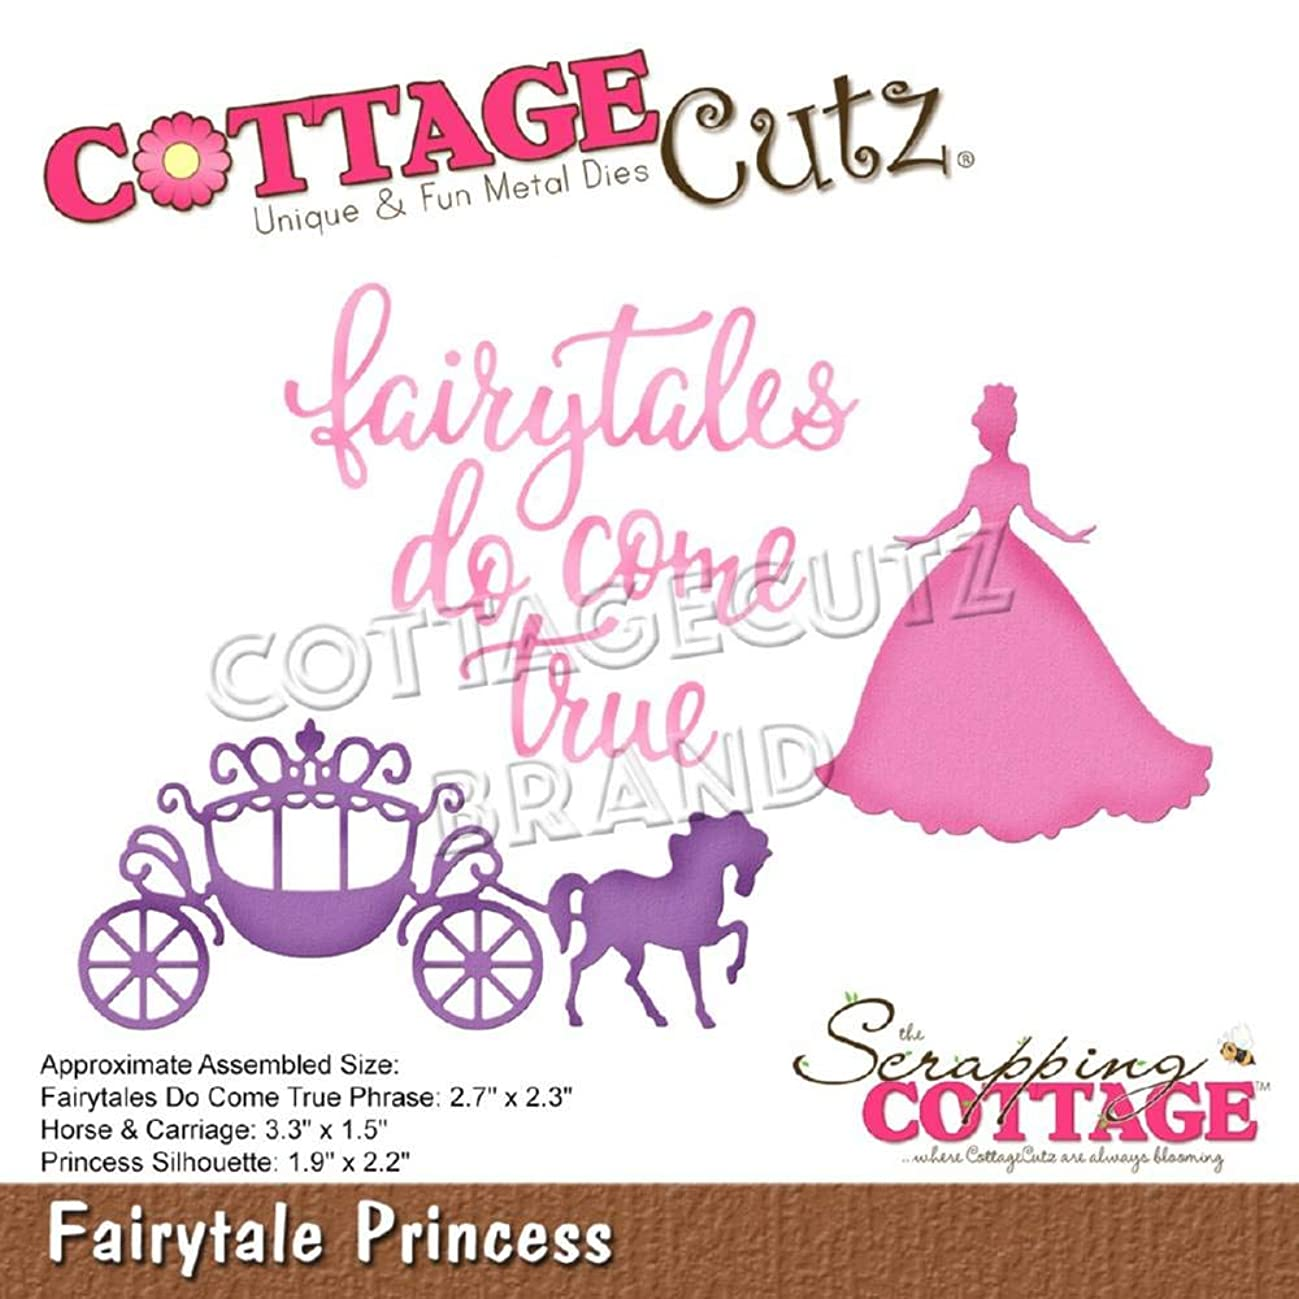 CottageCutz Fairytale Princess